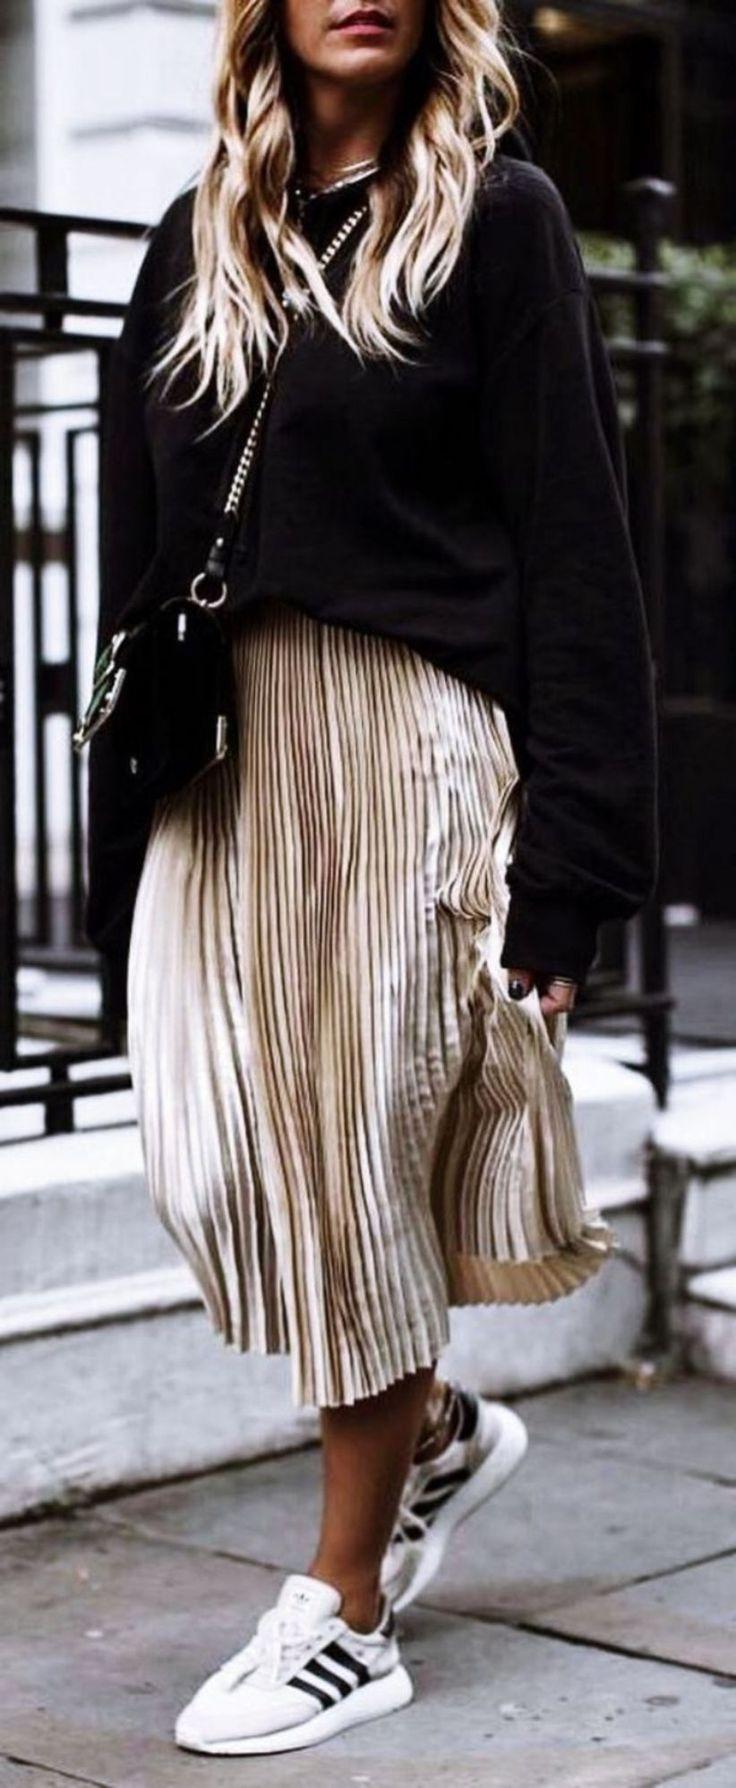 Photo of 60 Atemberaubende lässige Herbst-Outfit mit Sneakers #Fashion #Wo